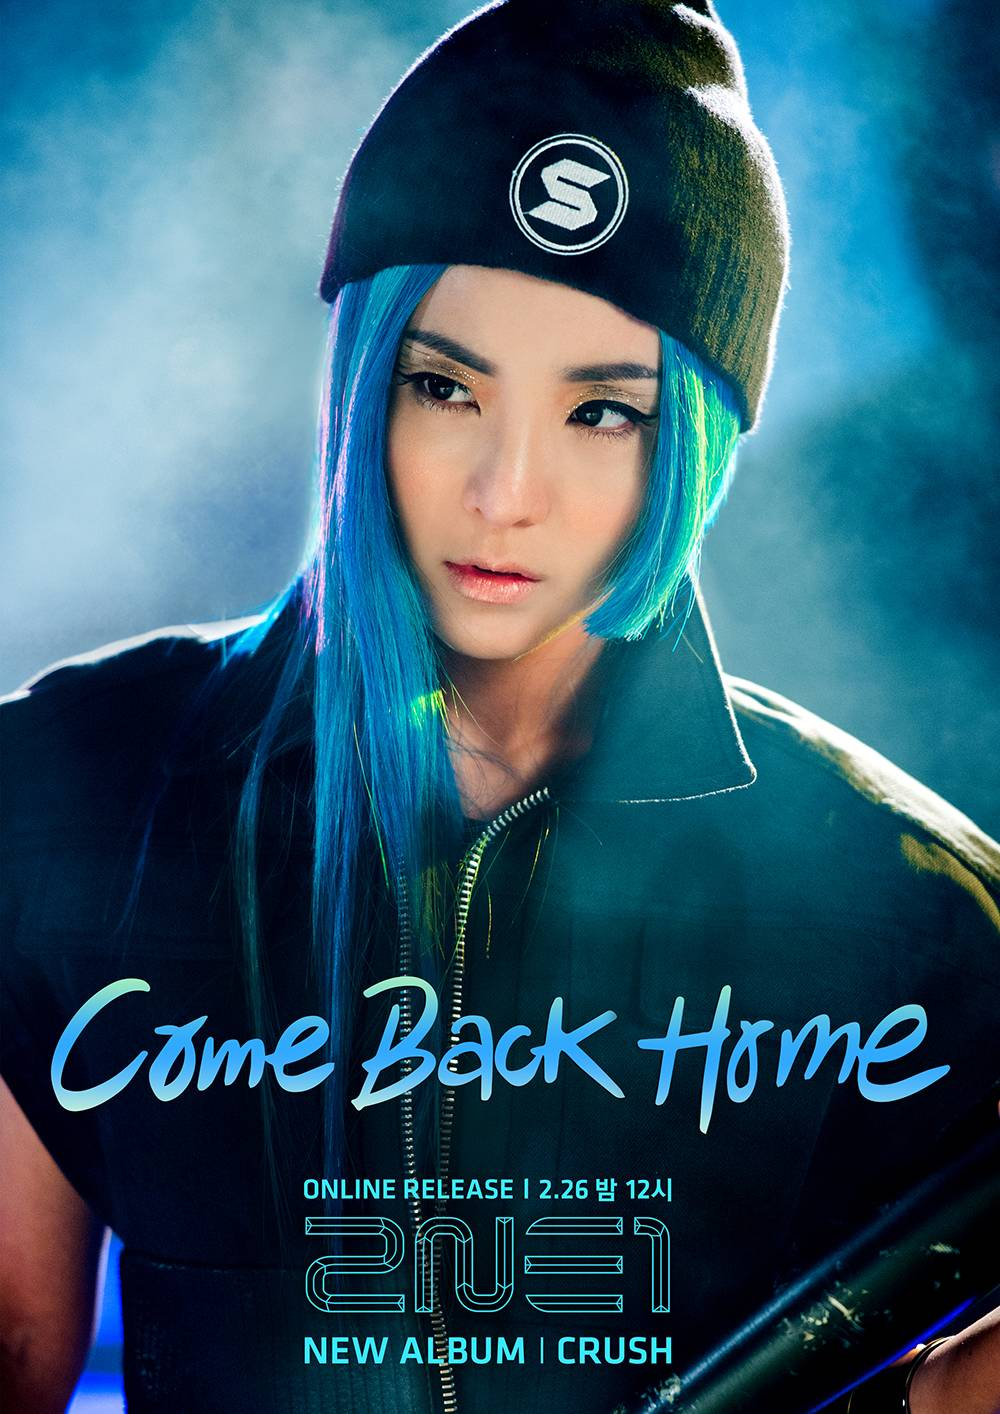 2ne1 come back home pictures.